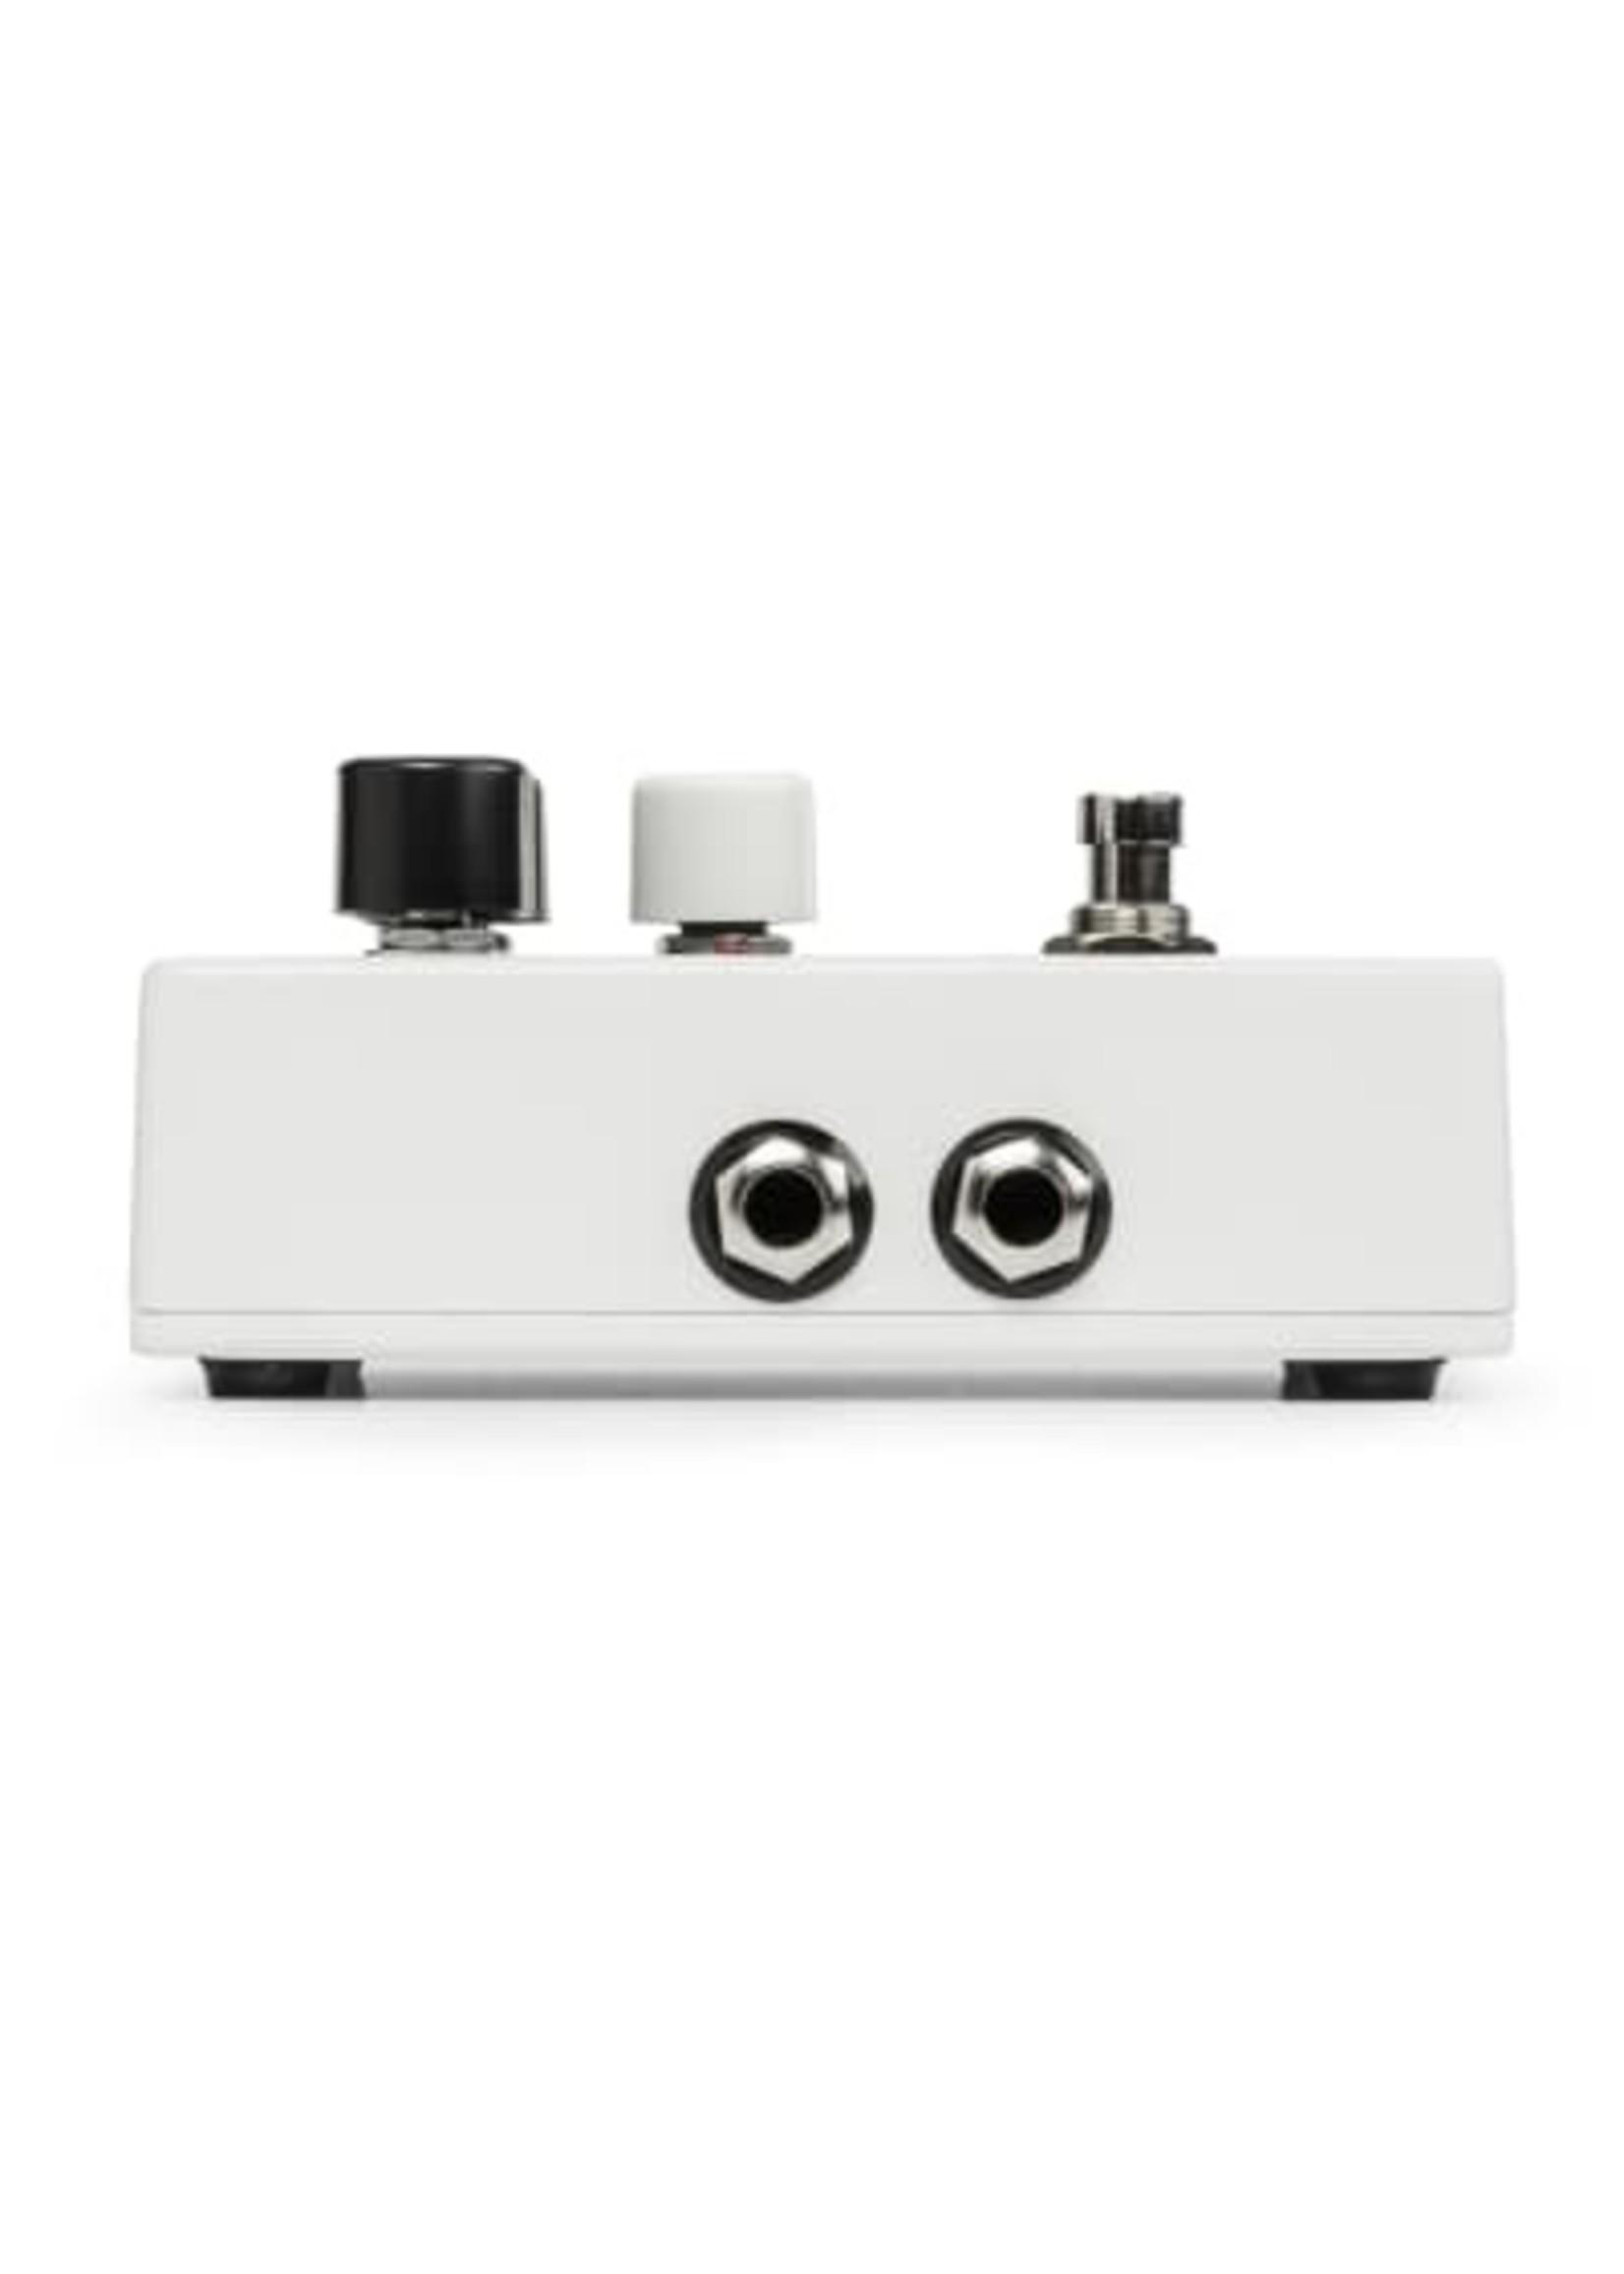 Electro-Harmonix Electro-Harmonix BASS9 Bass Machine Pedal